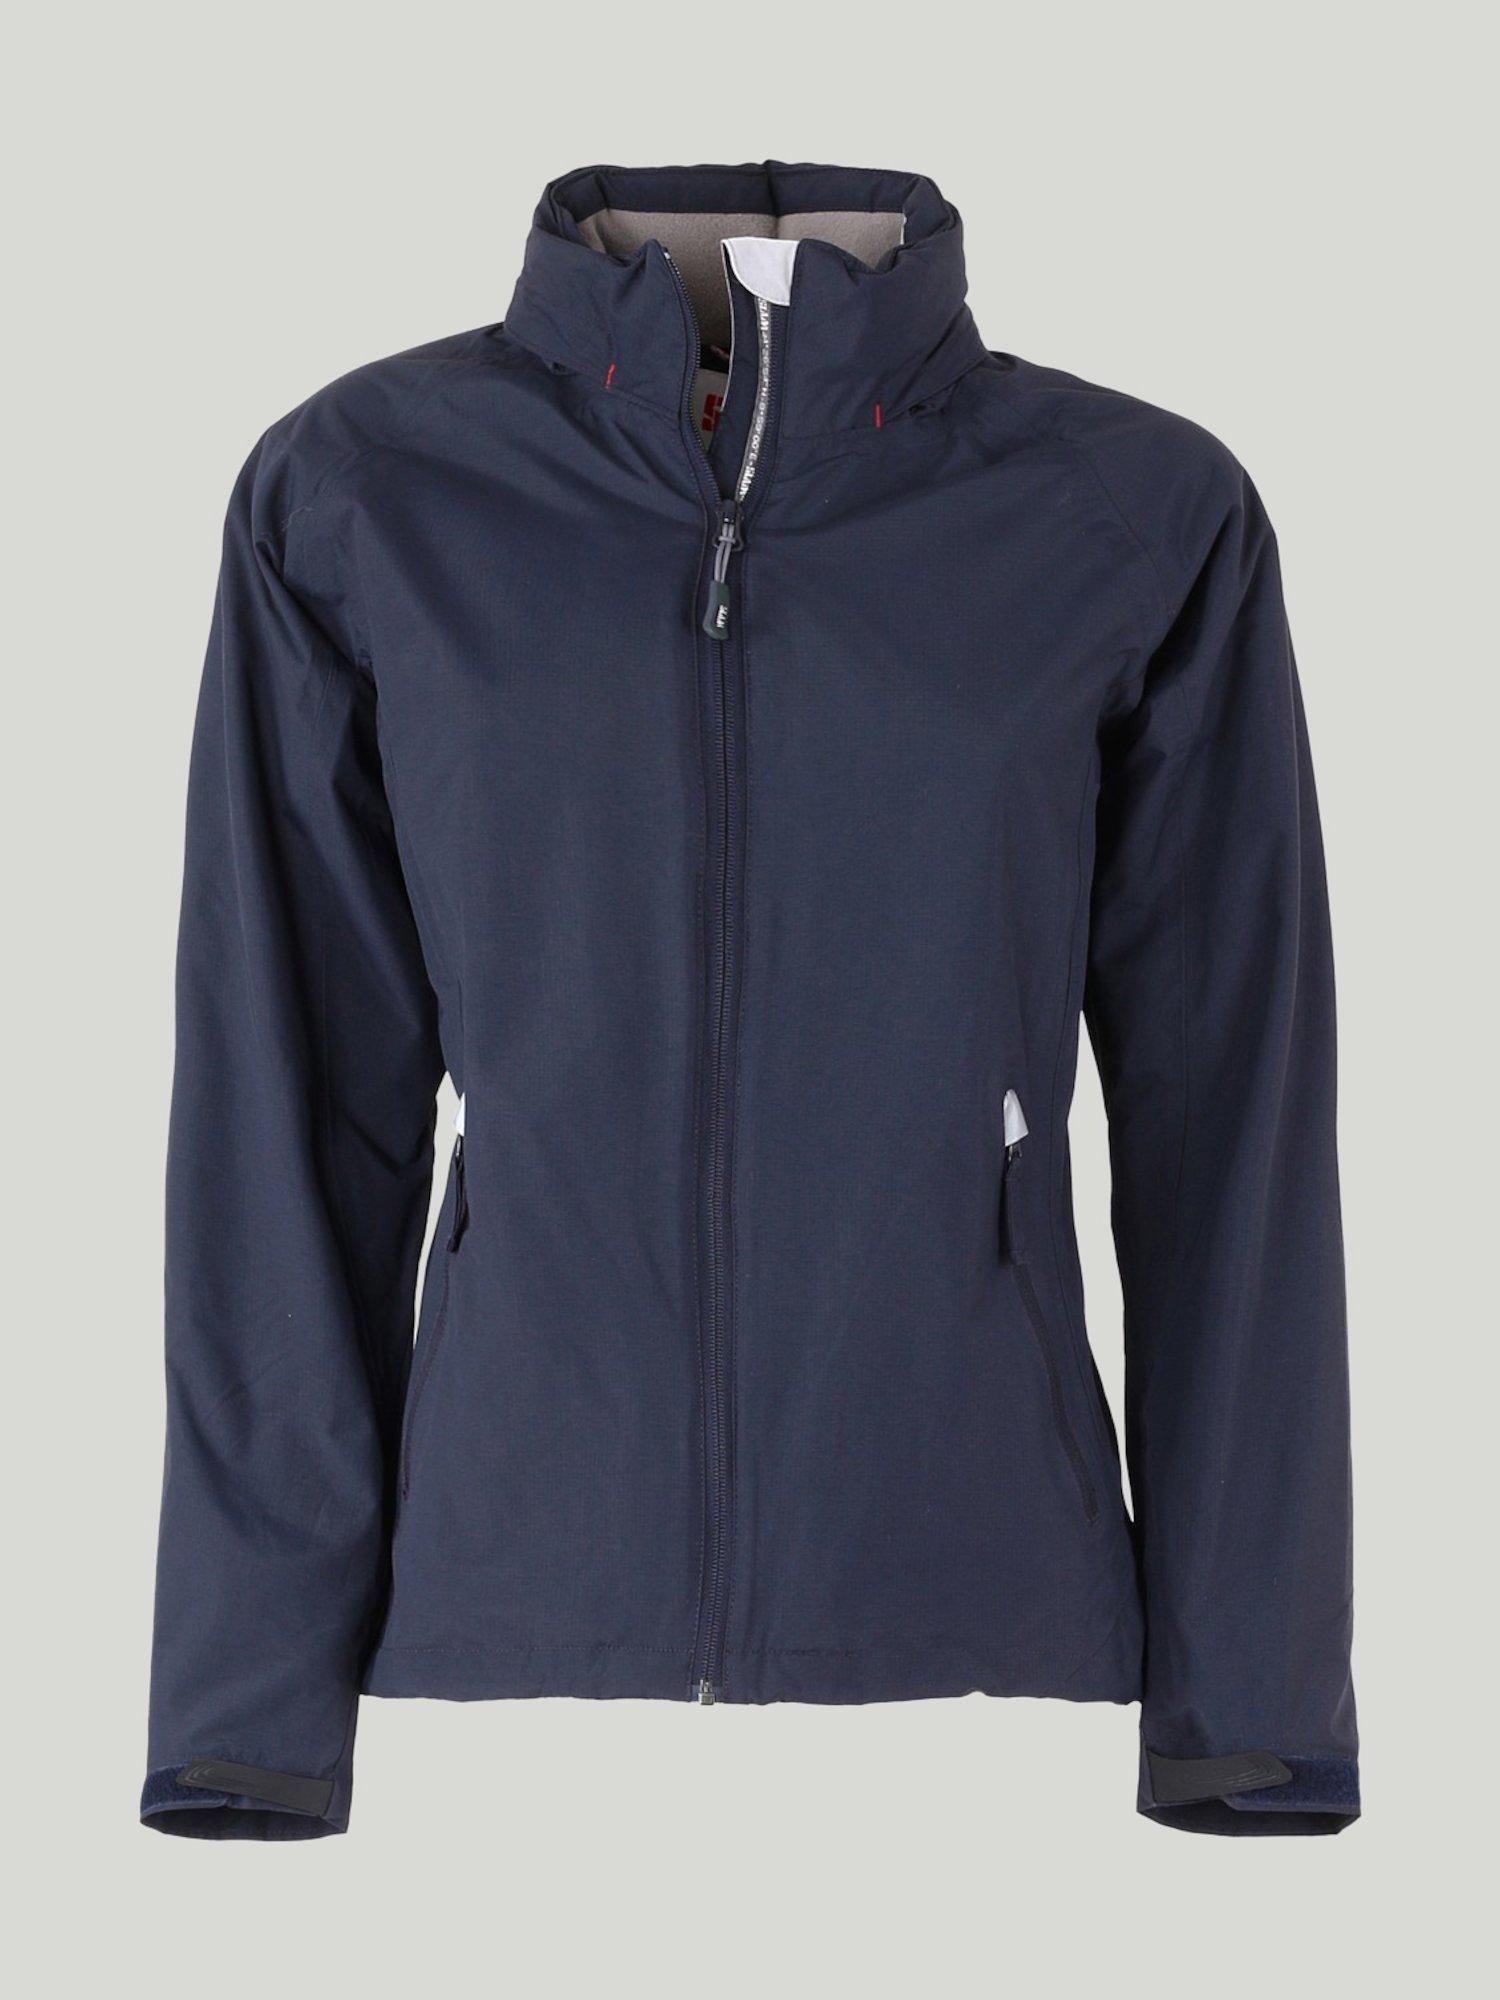 Women's Portocervo jacket - Navy